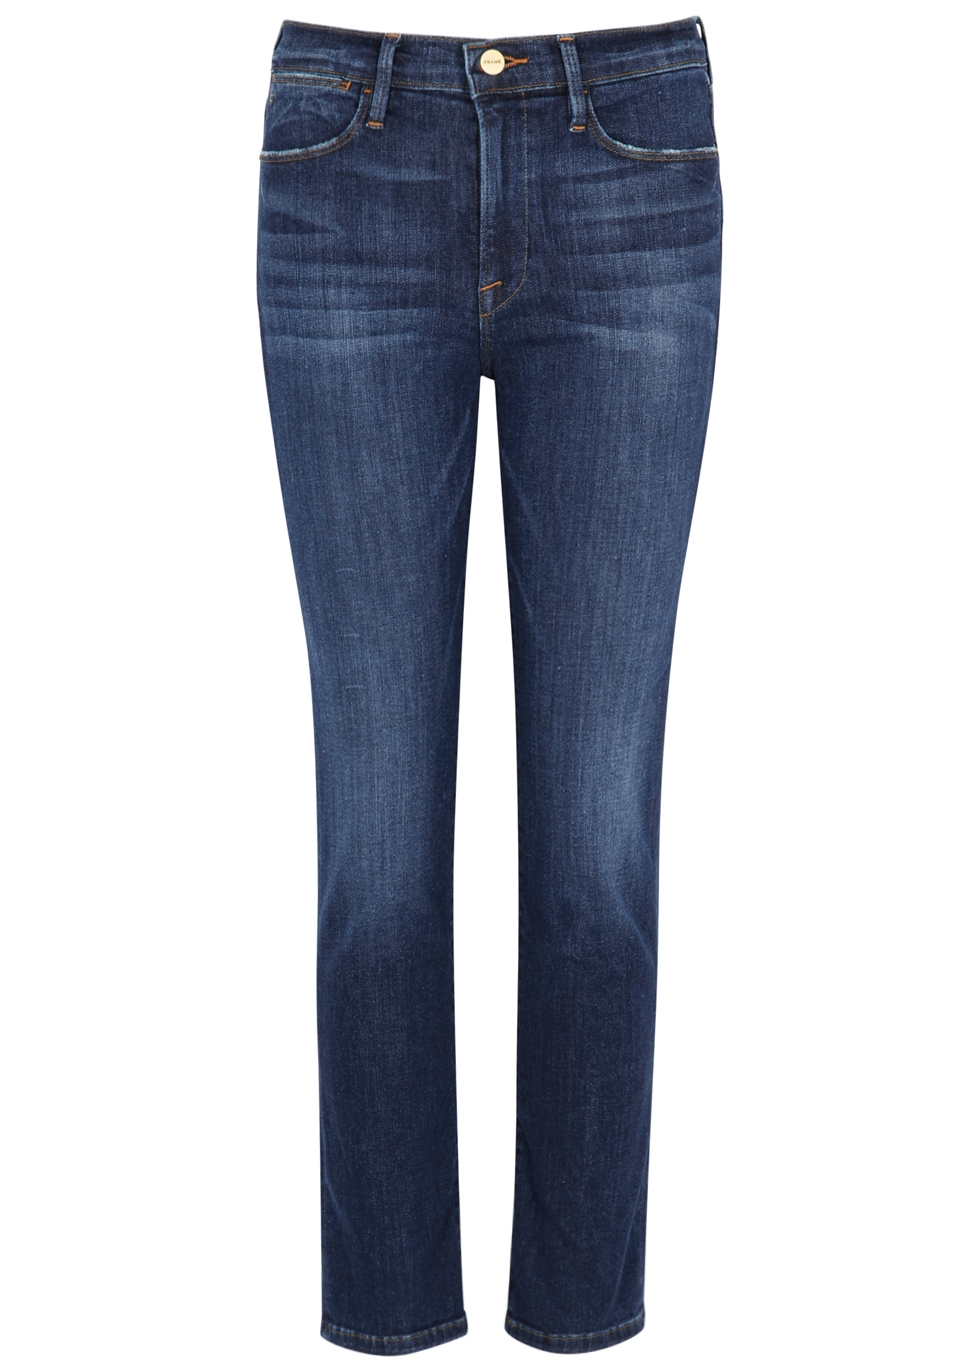 Le High Straight dark blue jeans